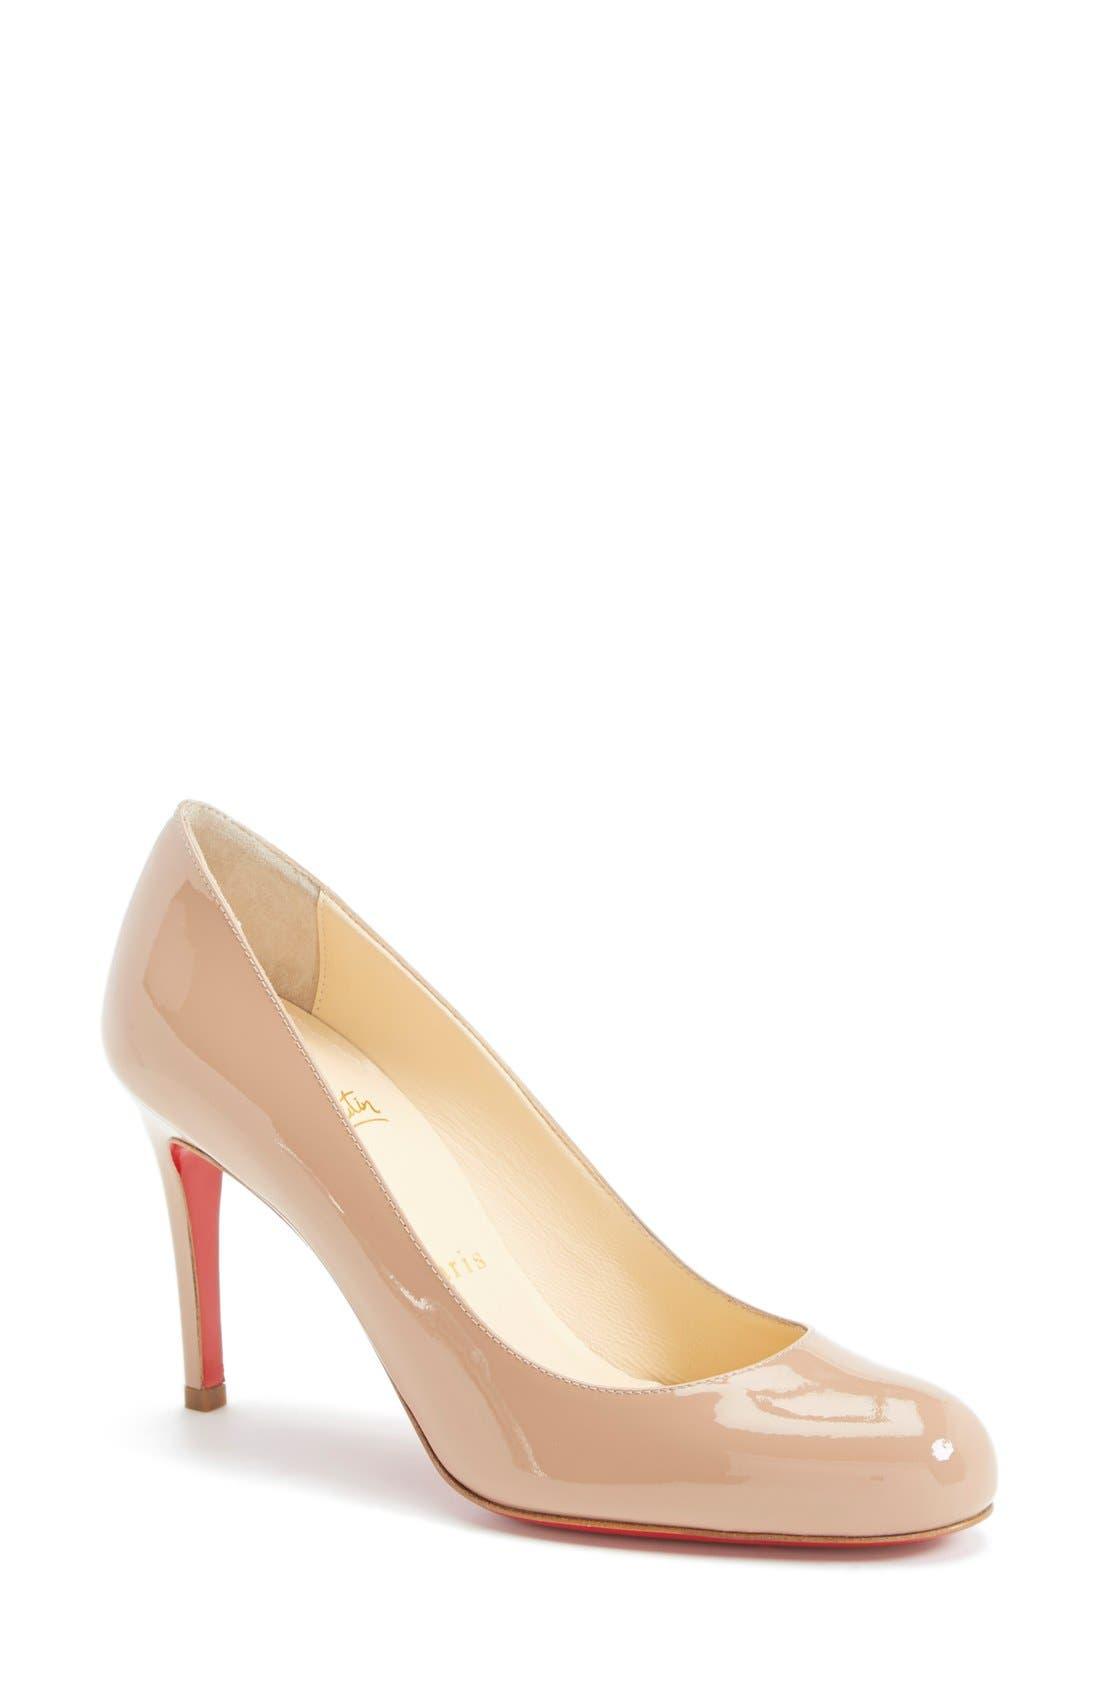 24273a29d55 Women's Christian Louboutin Shoes | Nordstrom